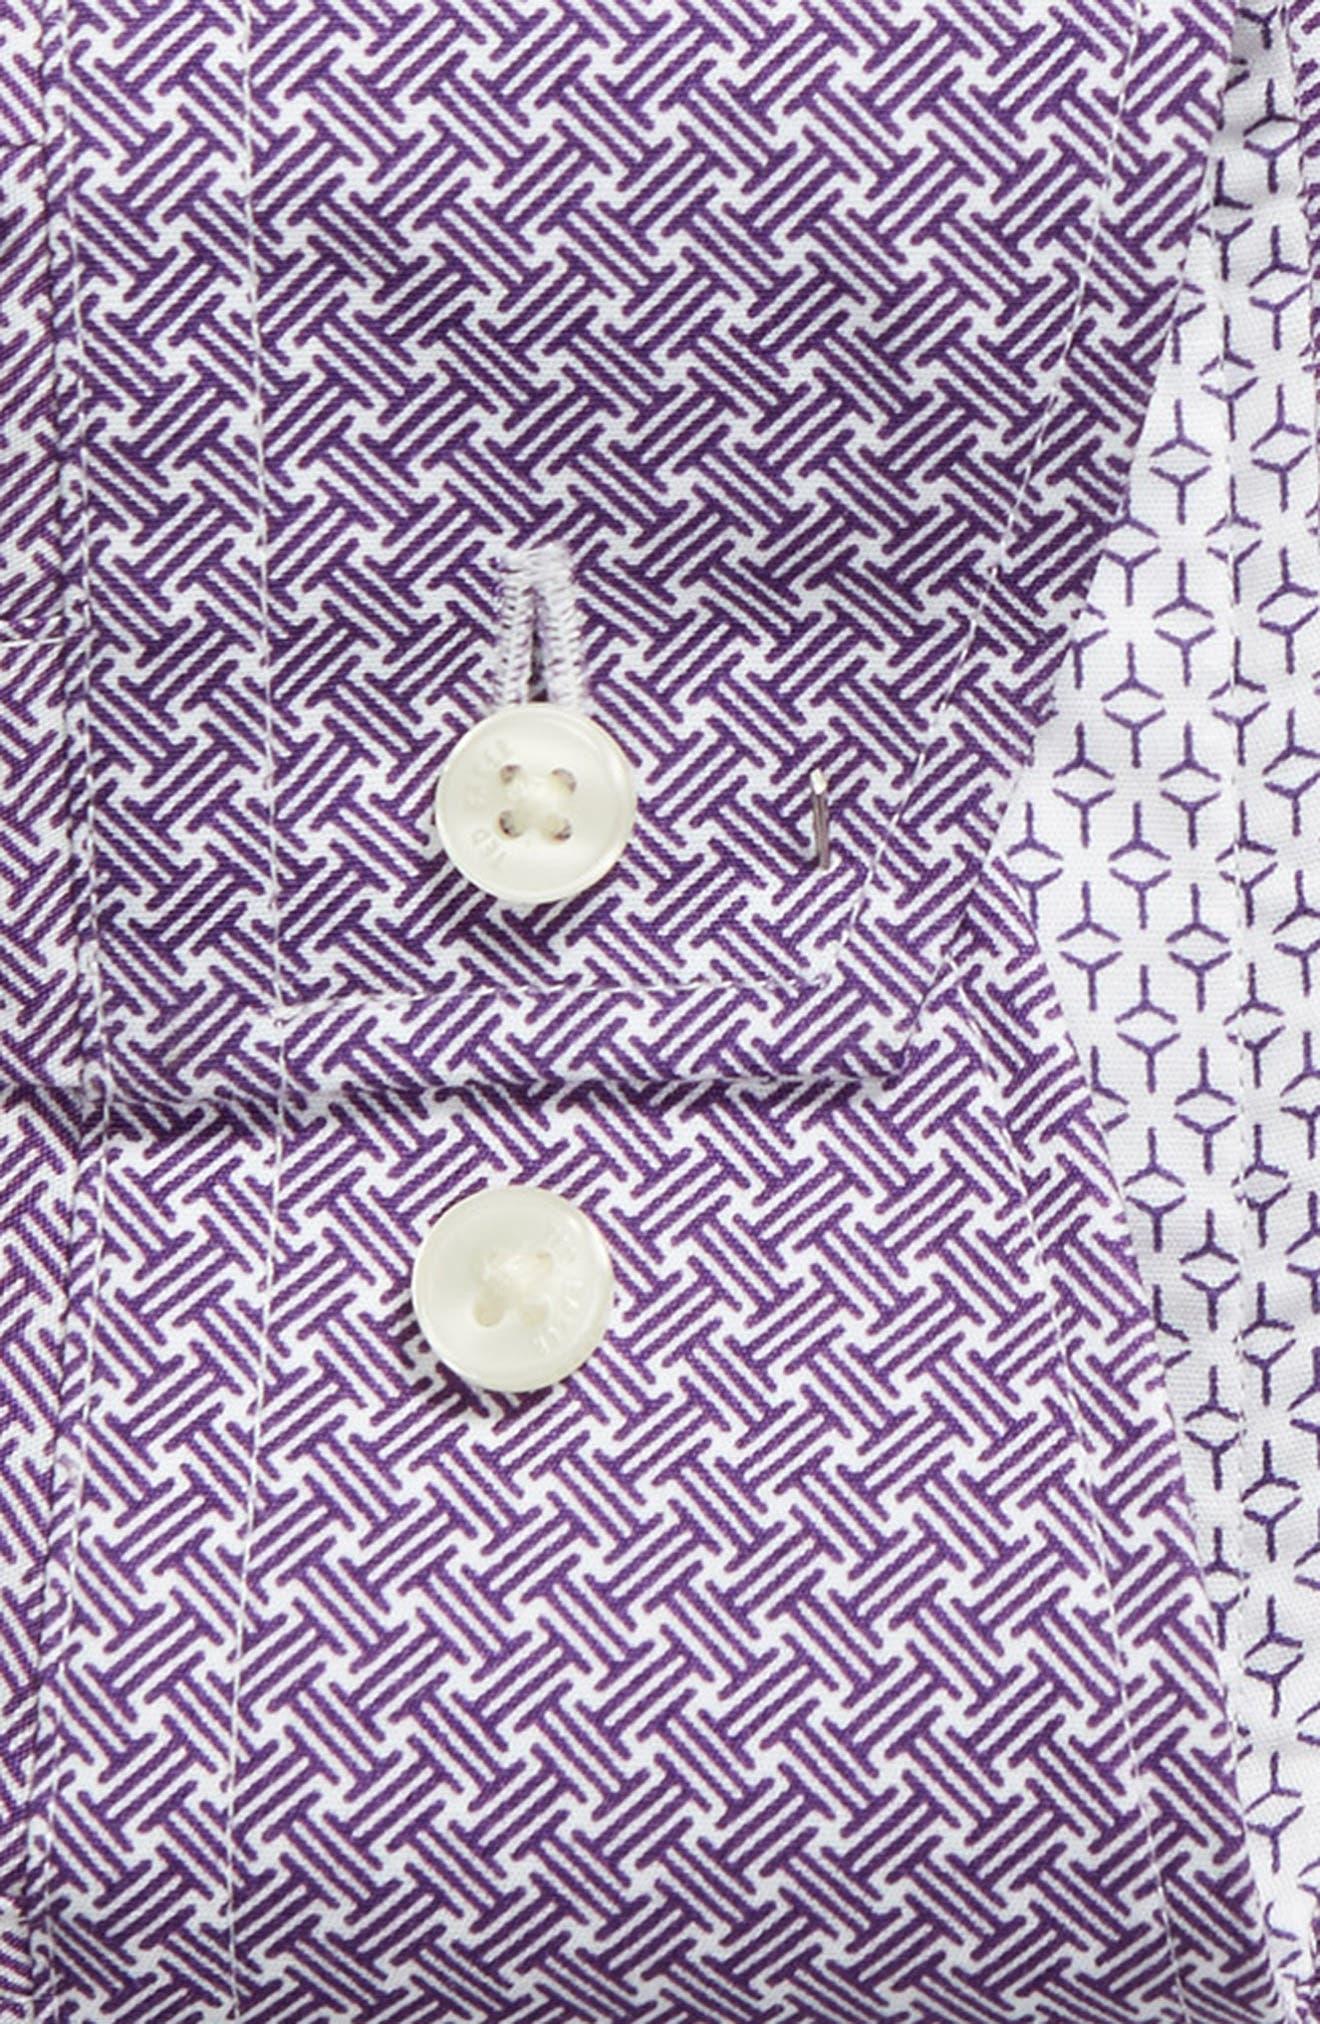 Rugber Slim Fit Print Dress Shirt,                             Alternate thumbnail 6, color,                             PURPLE